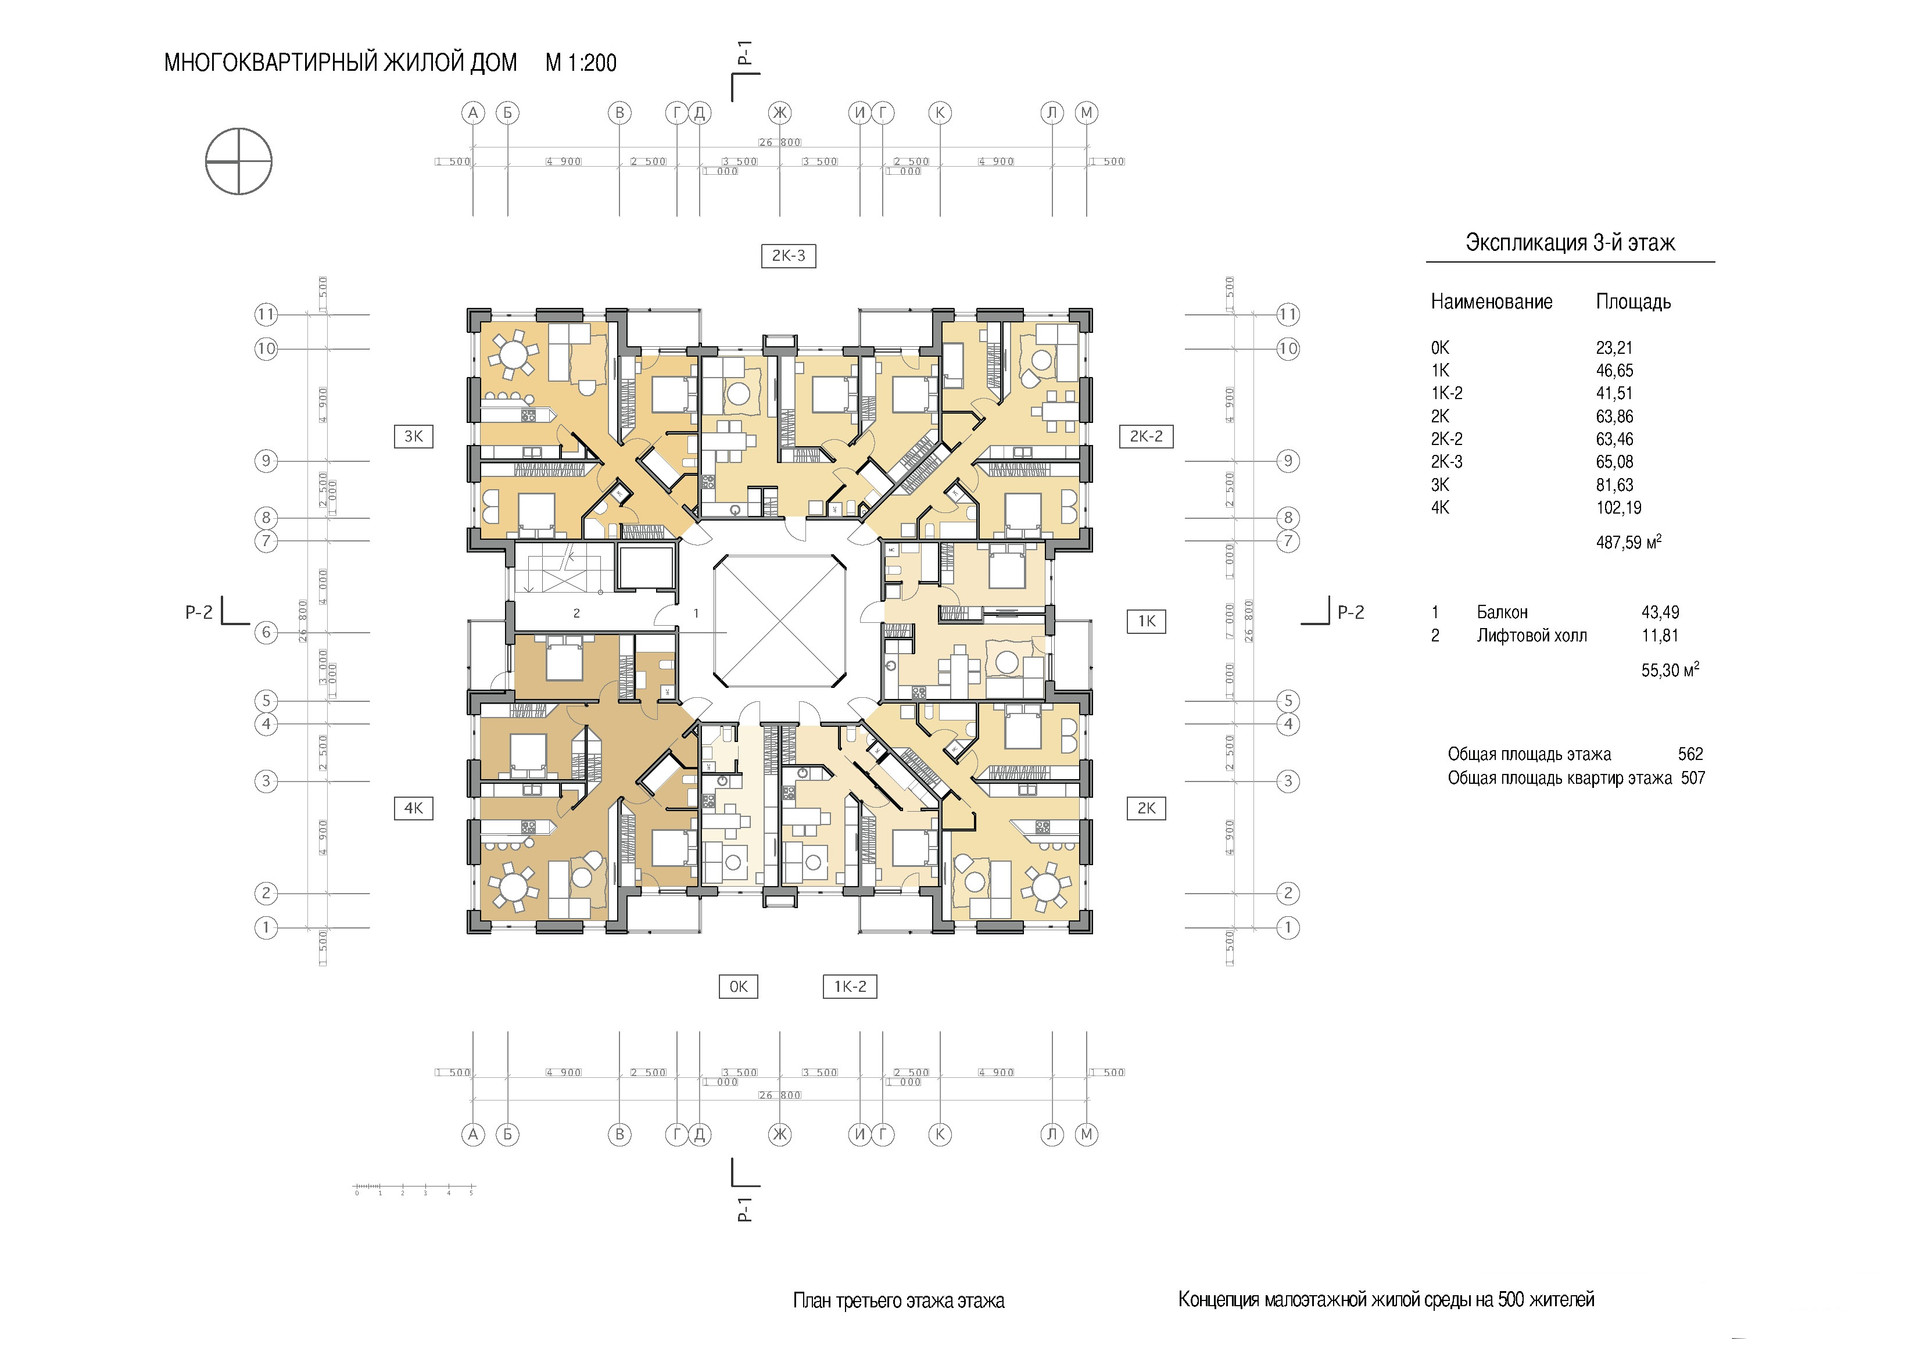 Inked03 План трептьего этажа этажа_LI.jp